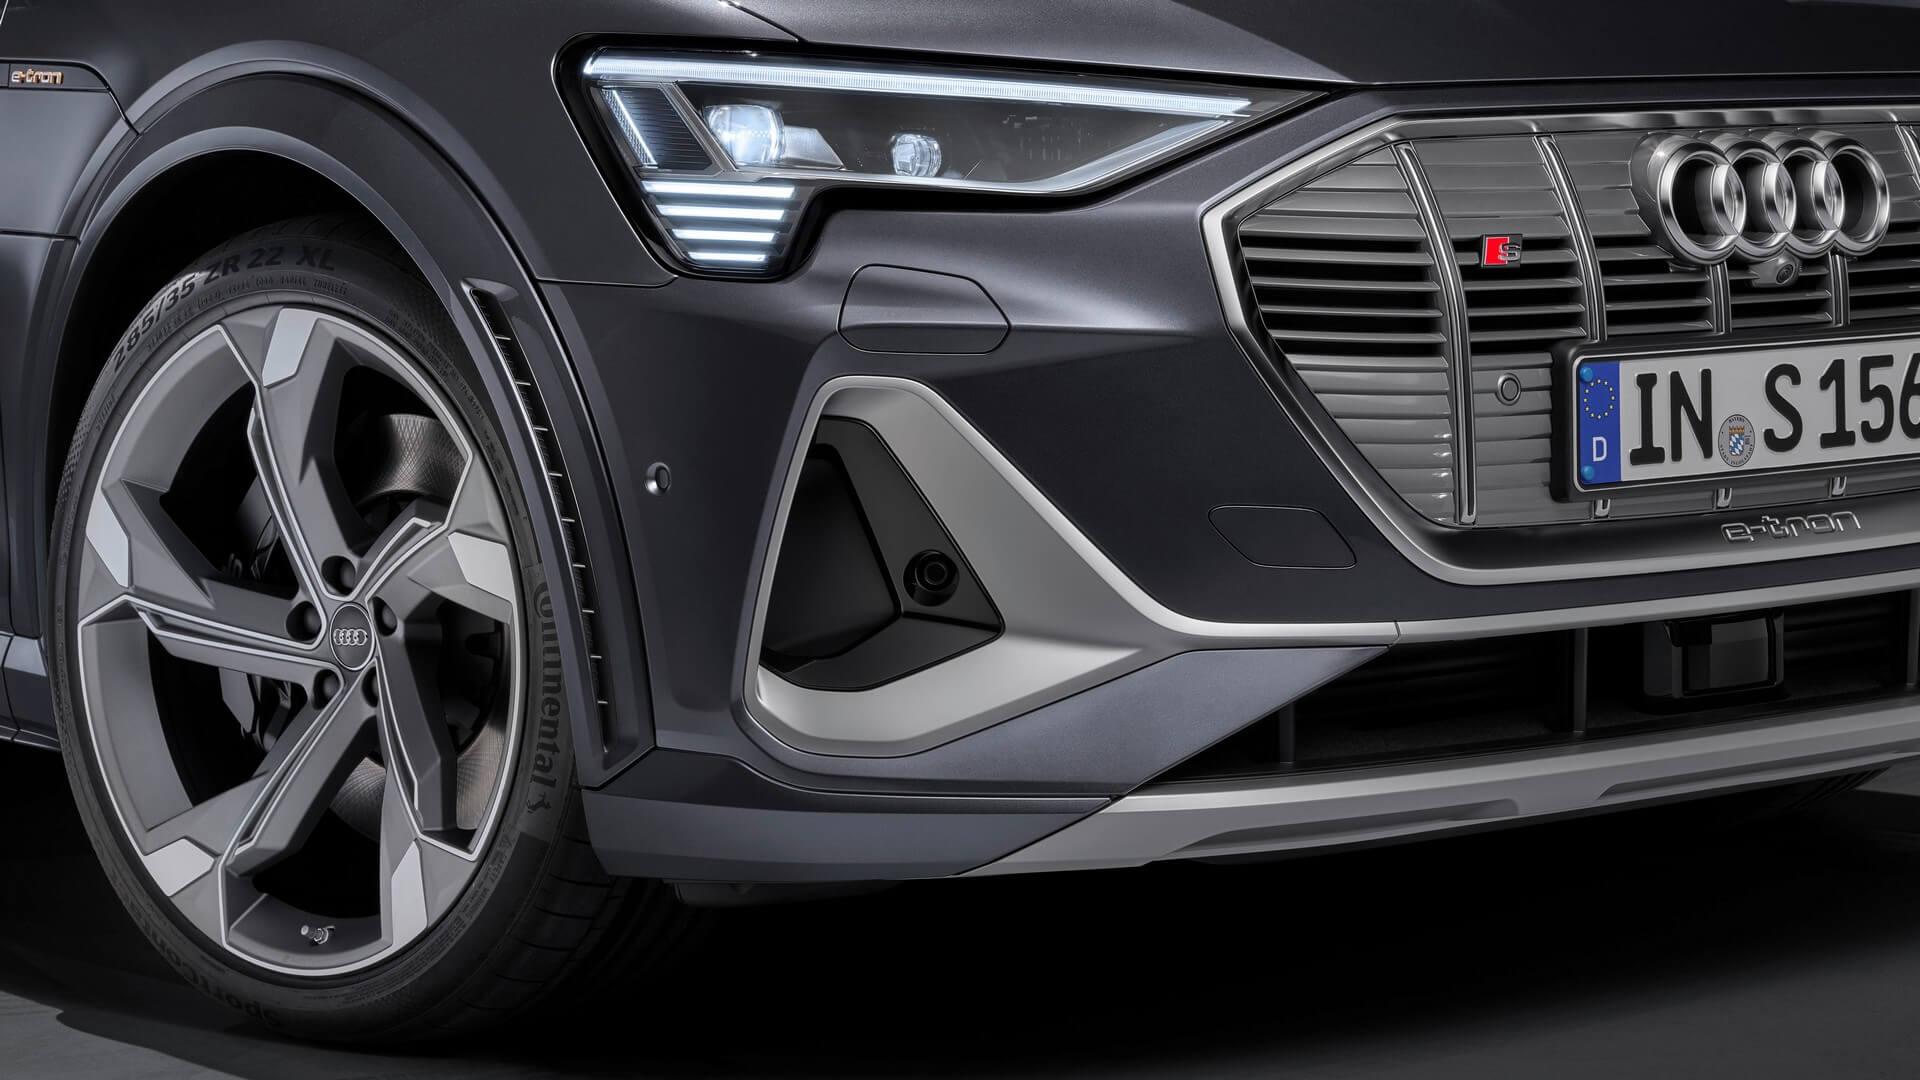 Audi-E-Tron-S-and-E-Tron-S-Sportback-2020-92